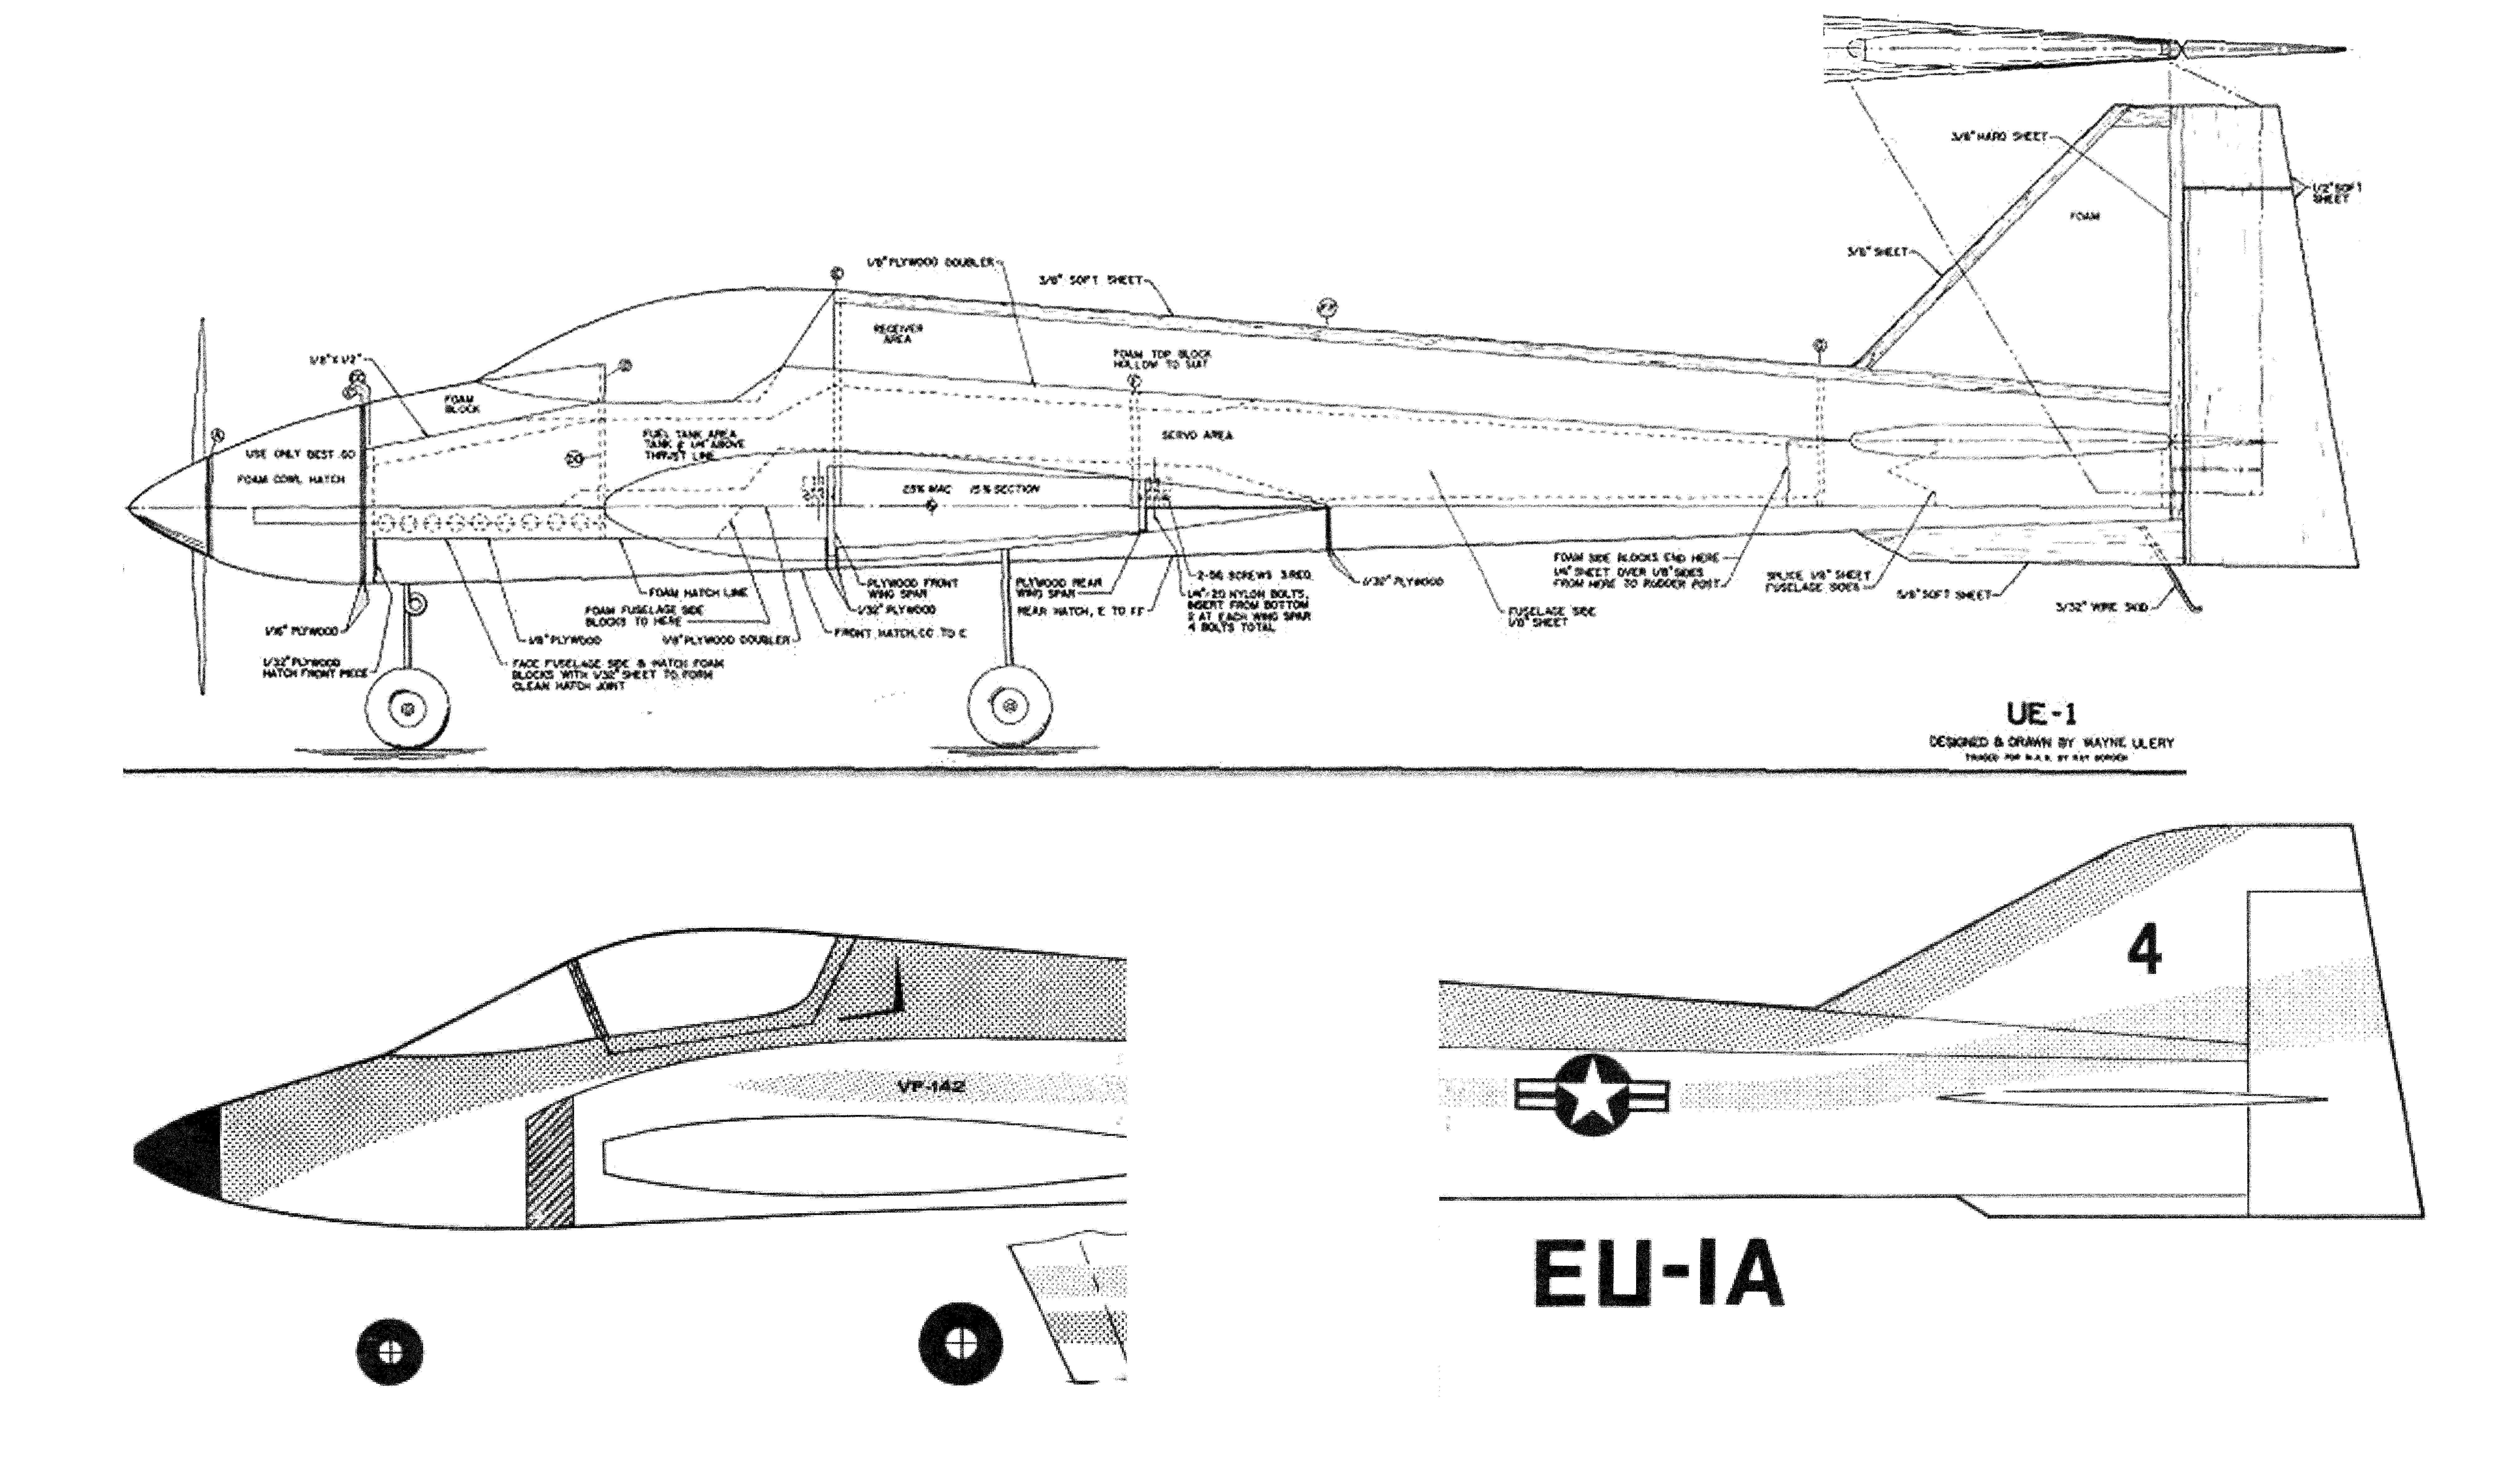 Click image for larger version  Name:EU-1 vs EU-1A b.jpg Views:134 Size:2.86 MB ID:2208299